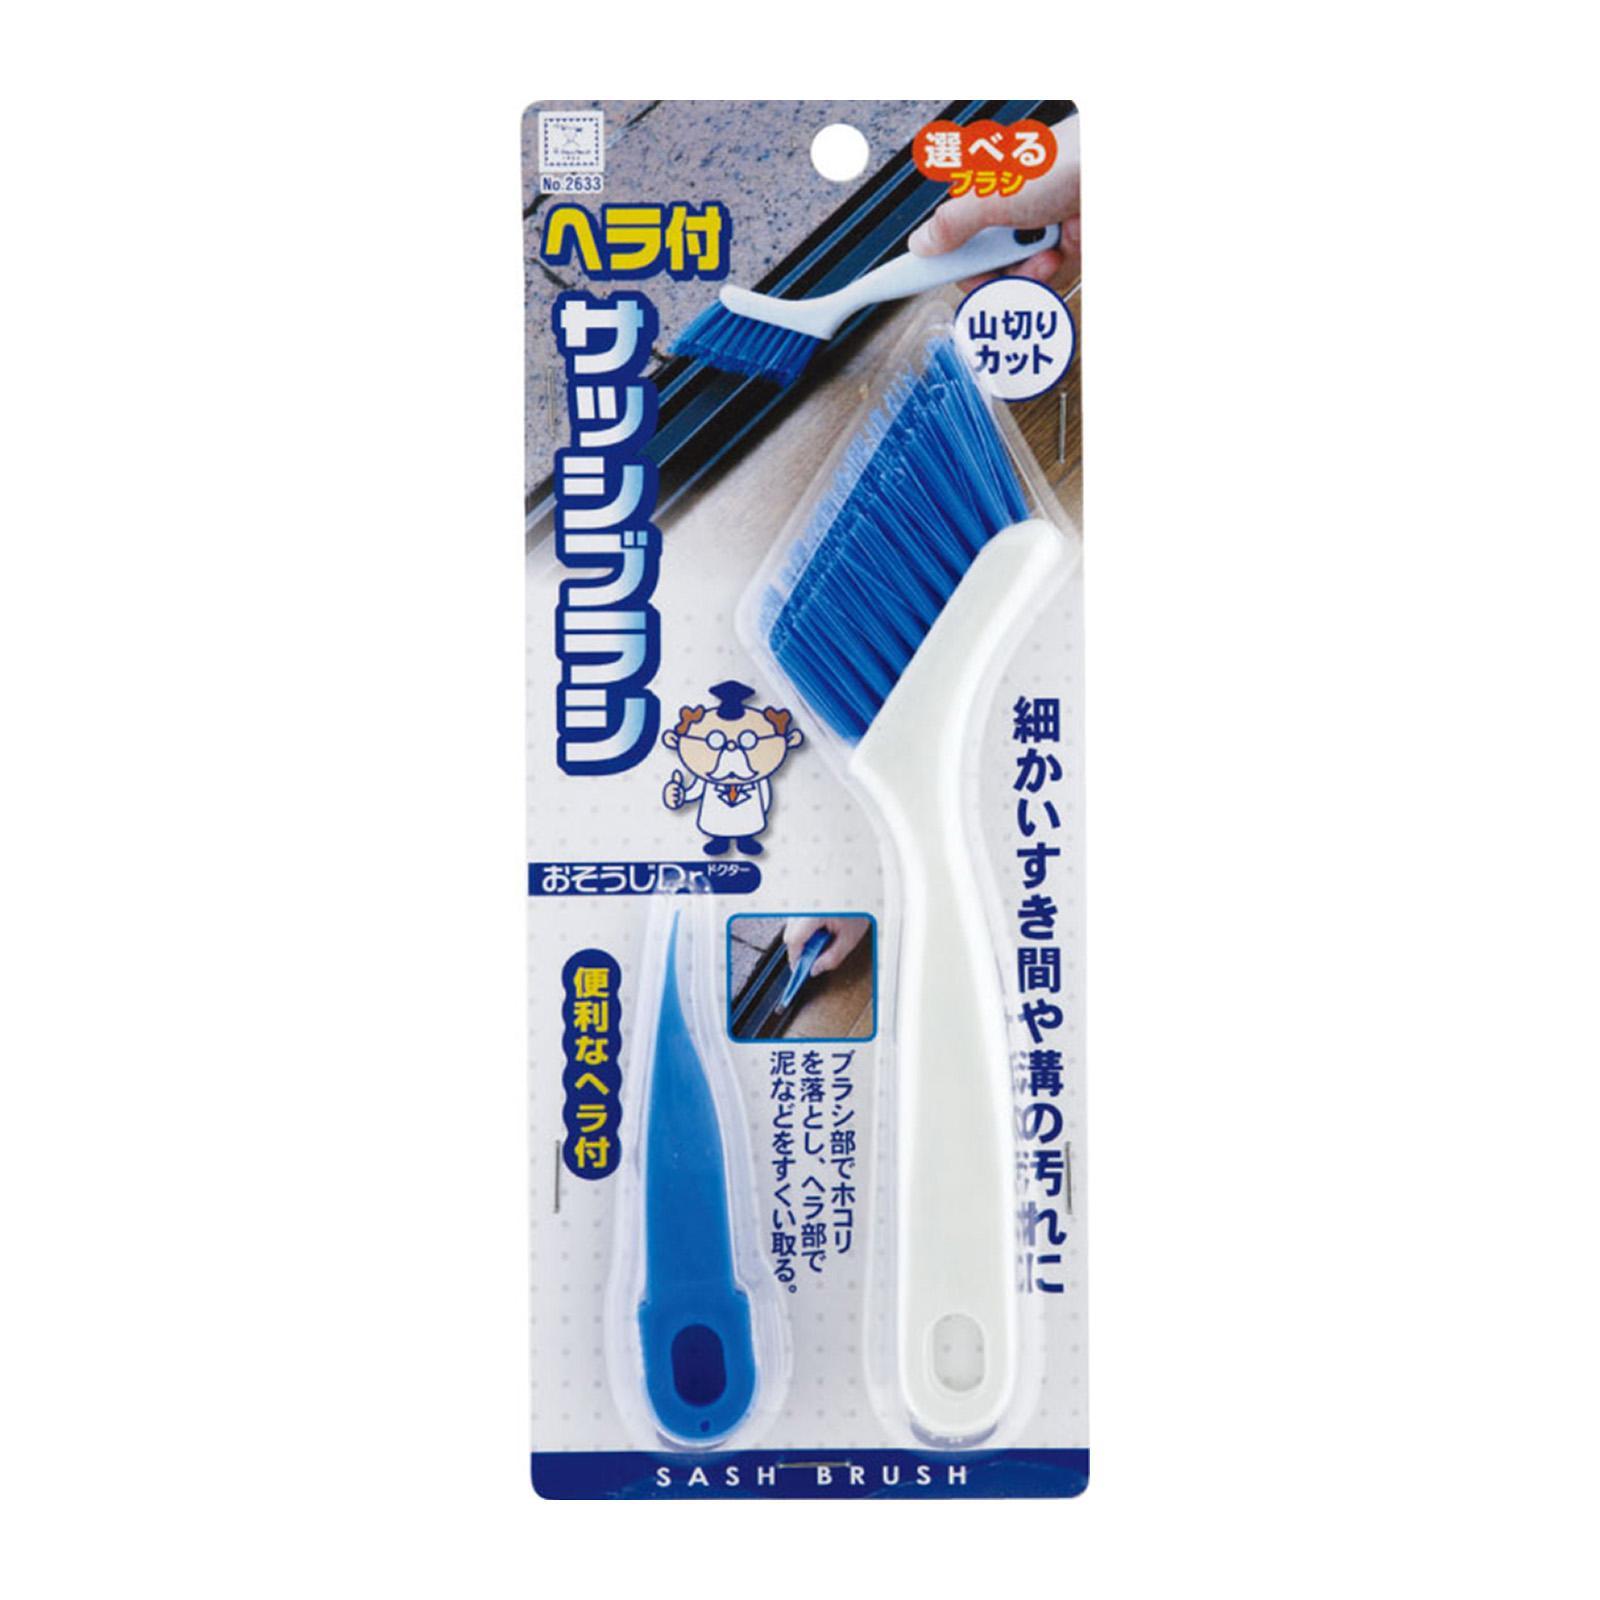 Kokubo Dr. Sash Brush With Spatula